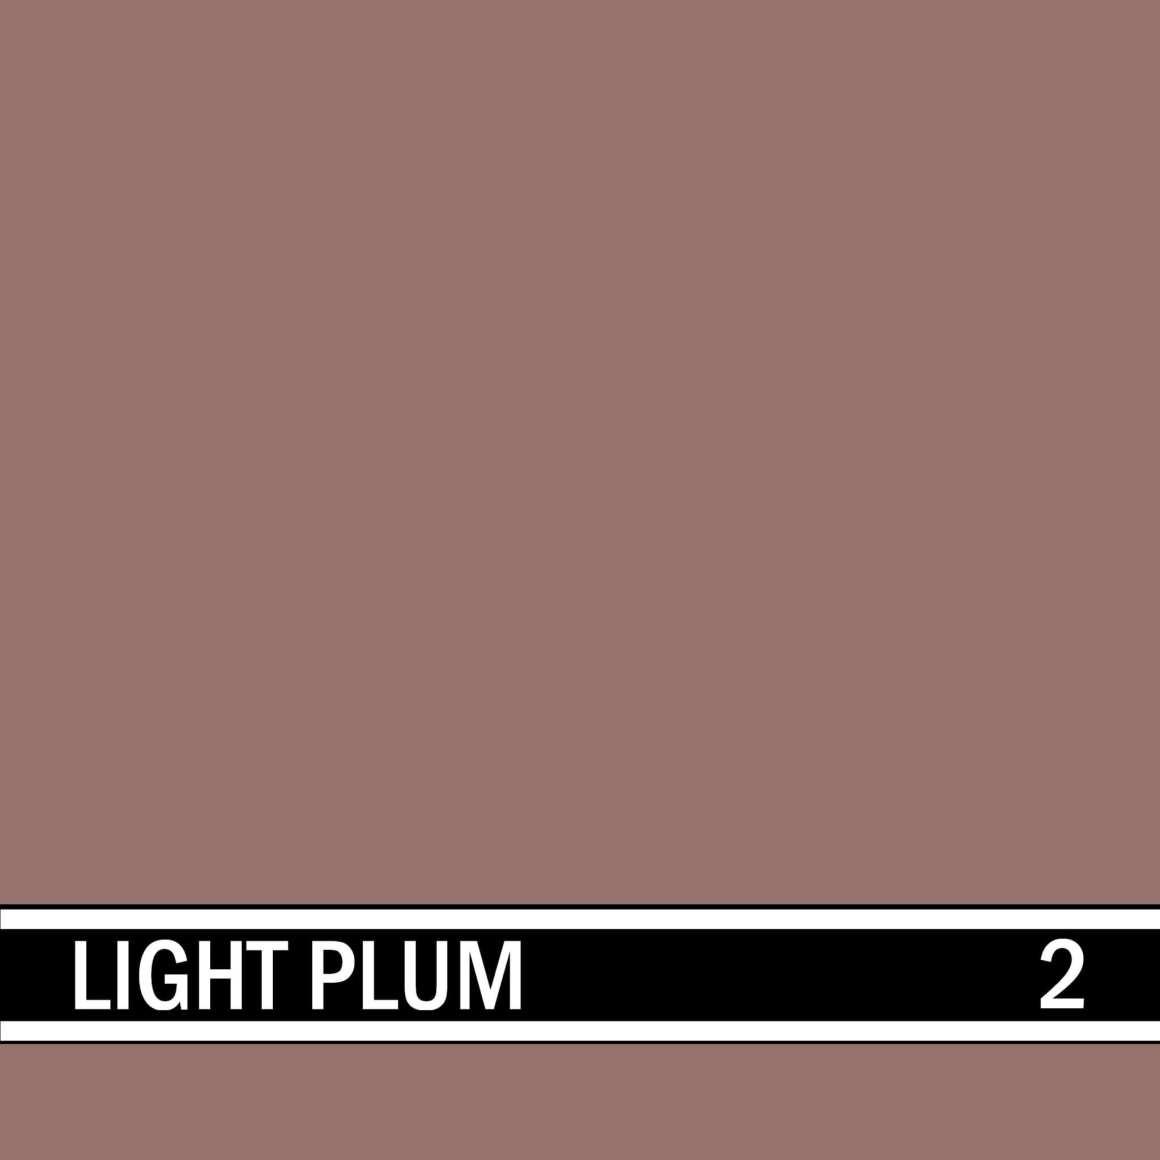 Light Plum integral concrete color for stamped concrete and decorative colored concrete